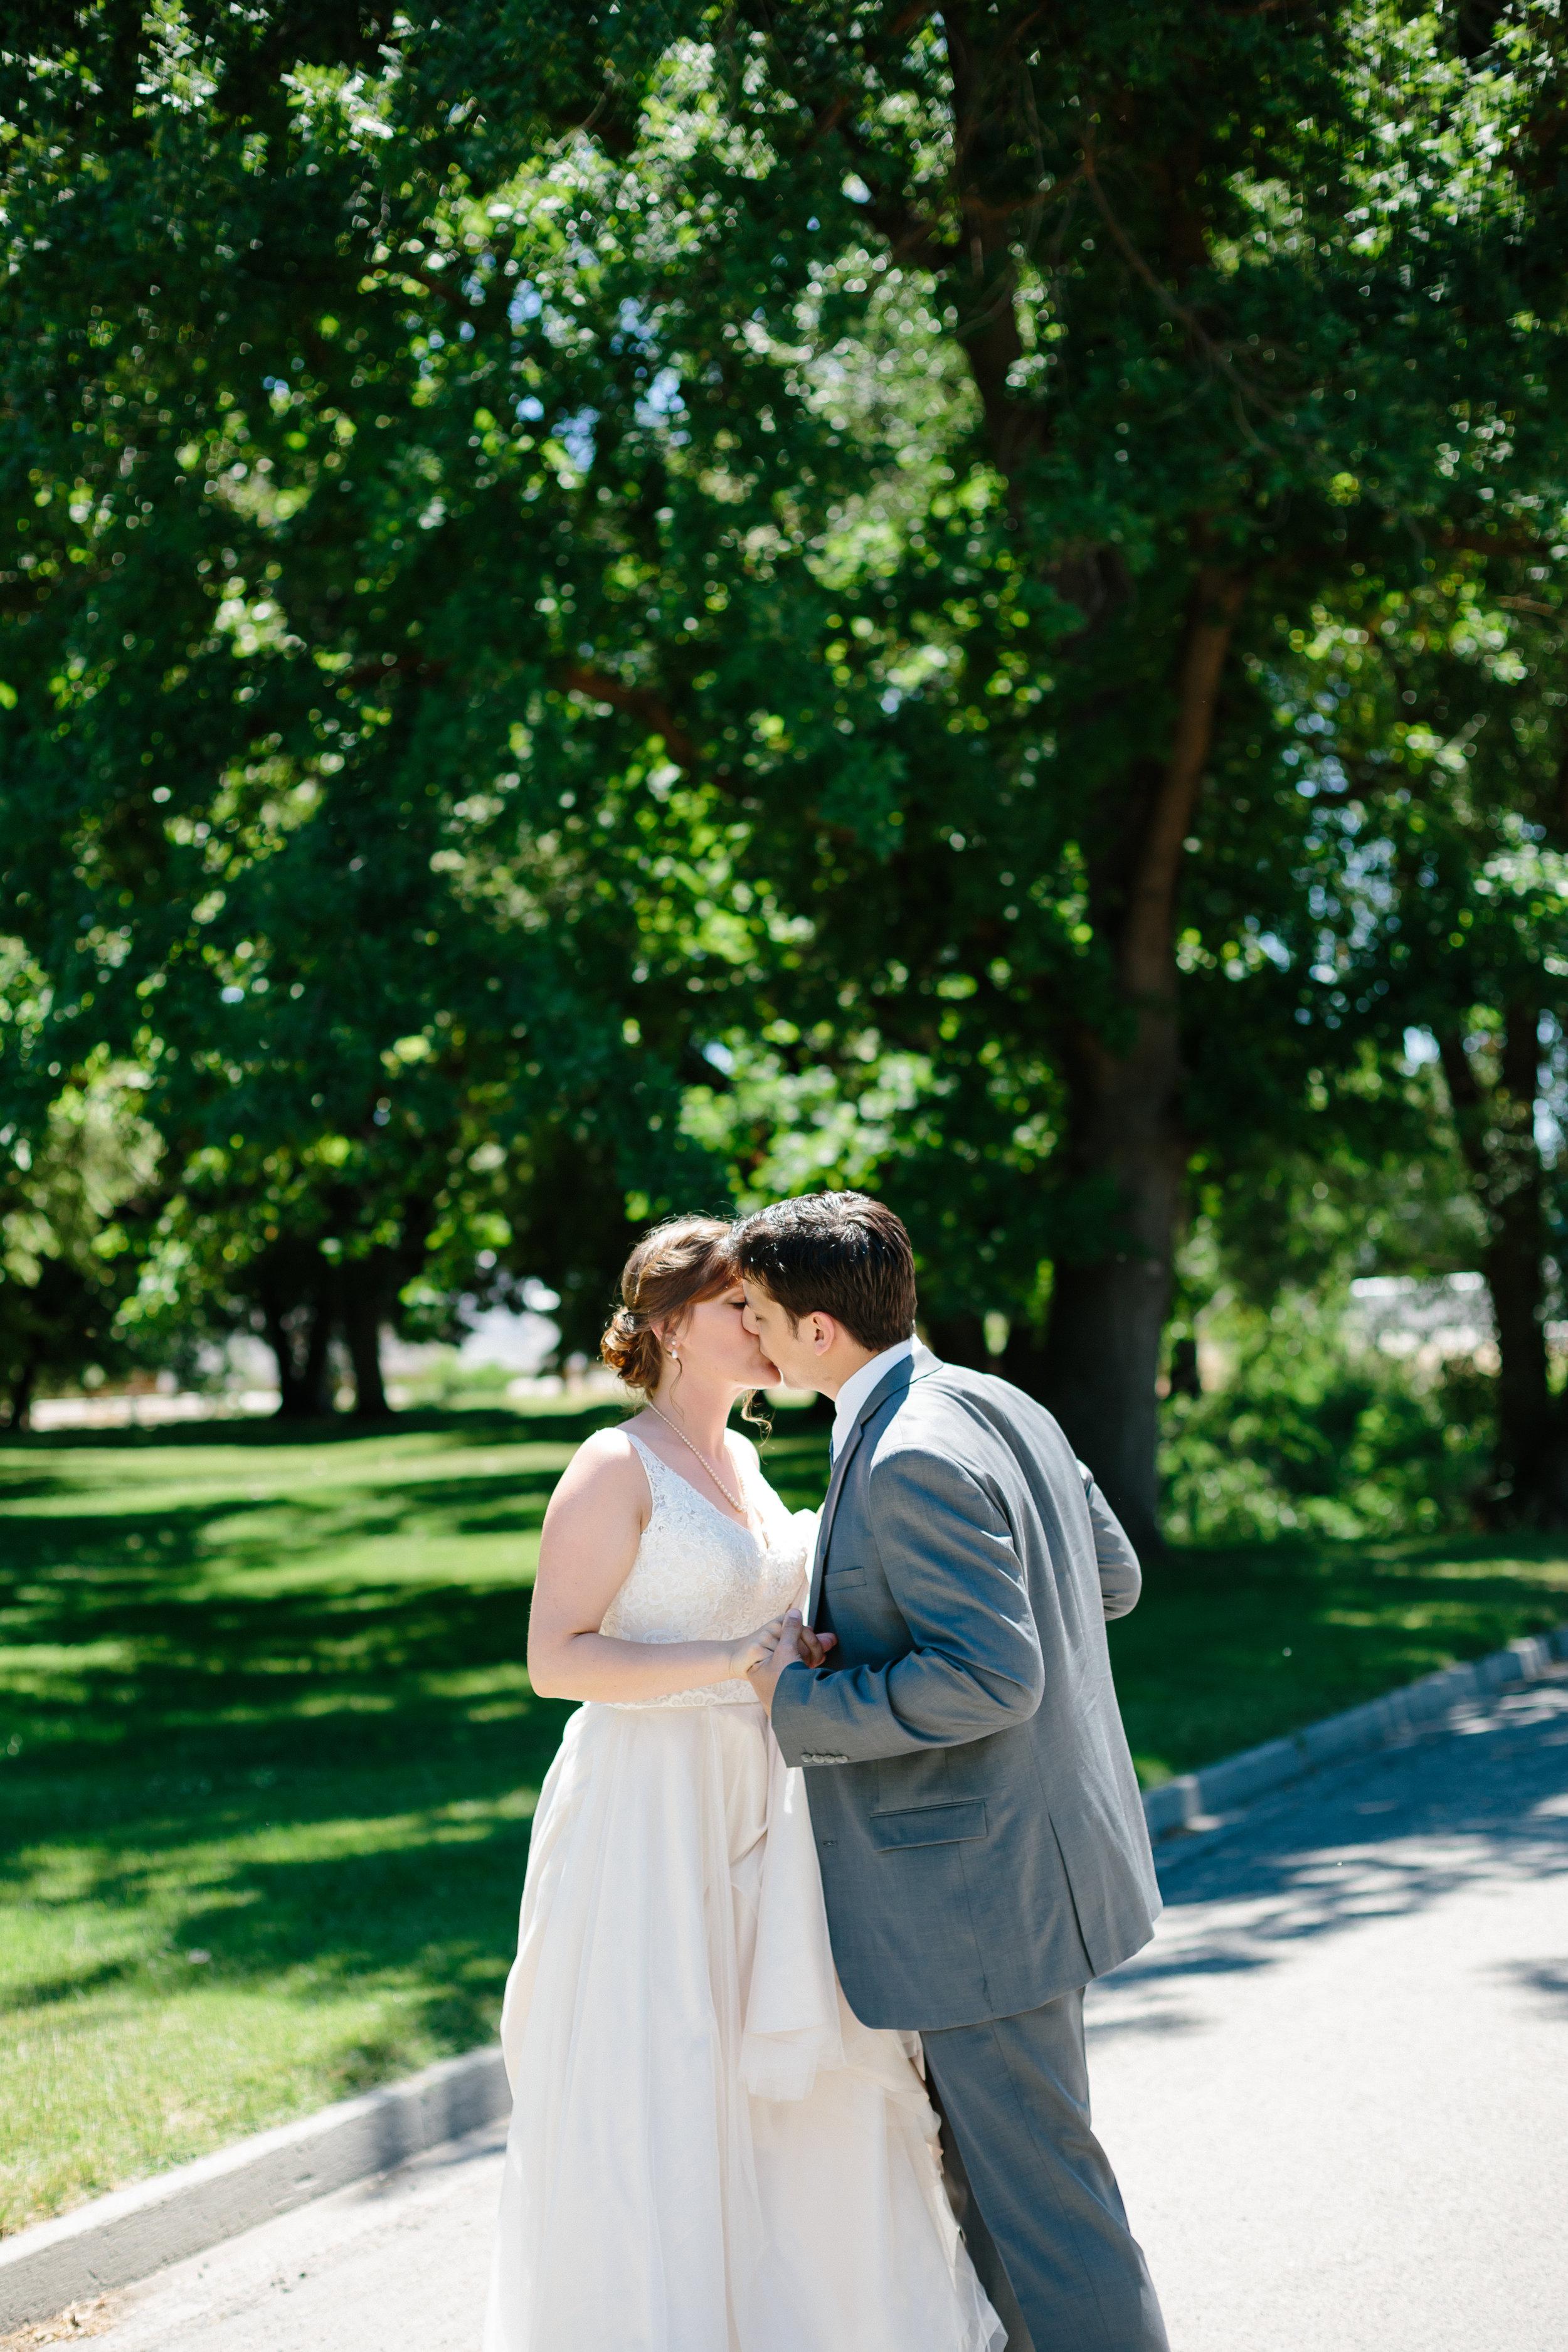 Jordan & Shantel Married - Idaho - Corrie Mick Photography-119.jpg